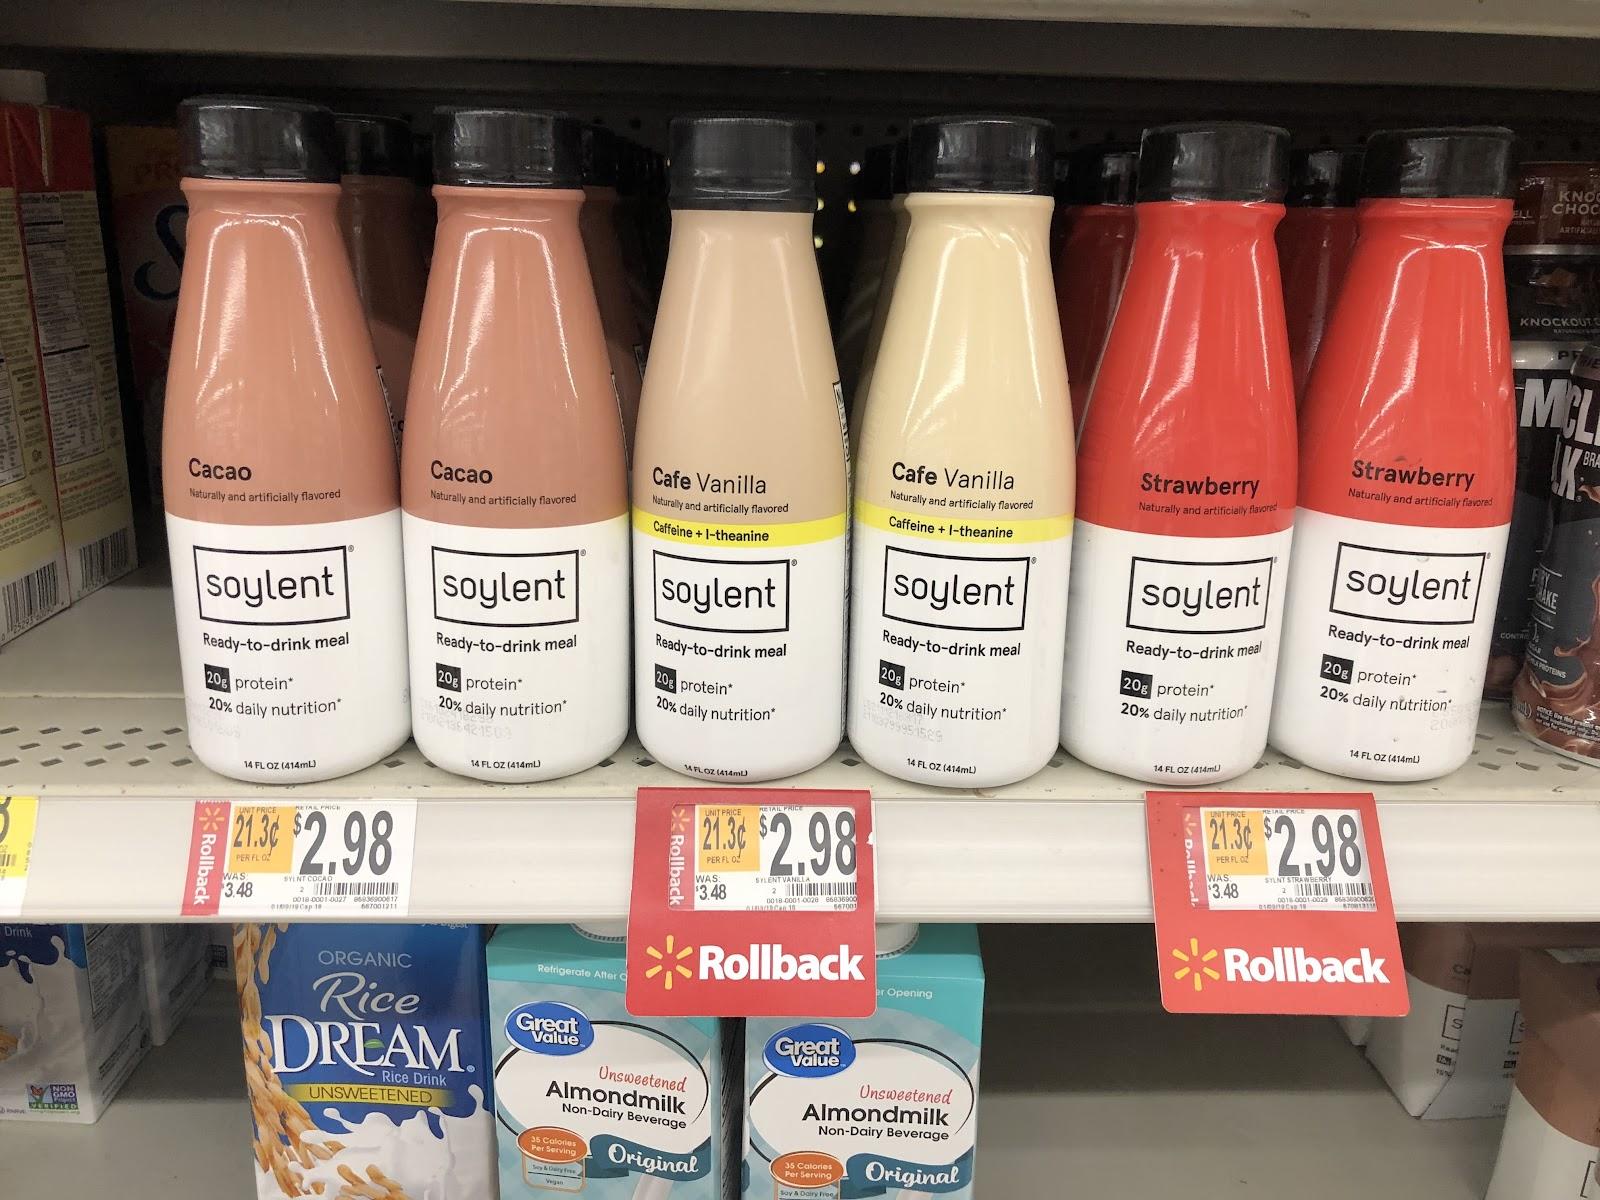 Soylent - Walmart Brand Partnership (DTC Growth)